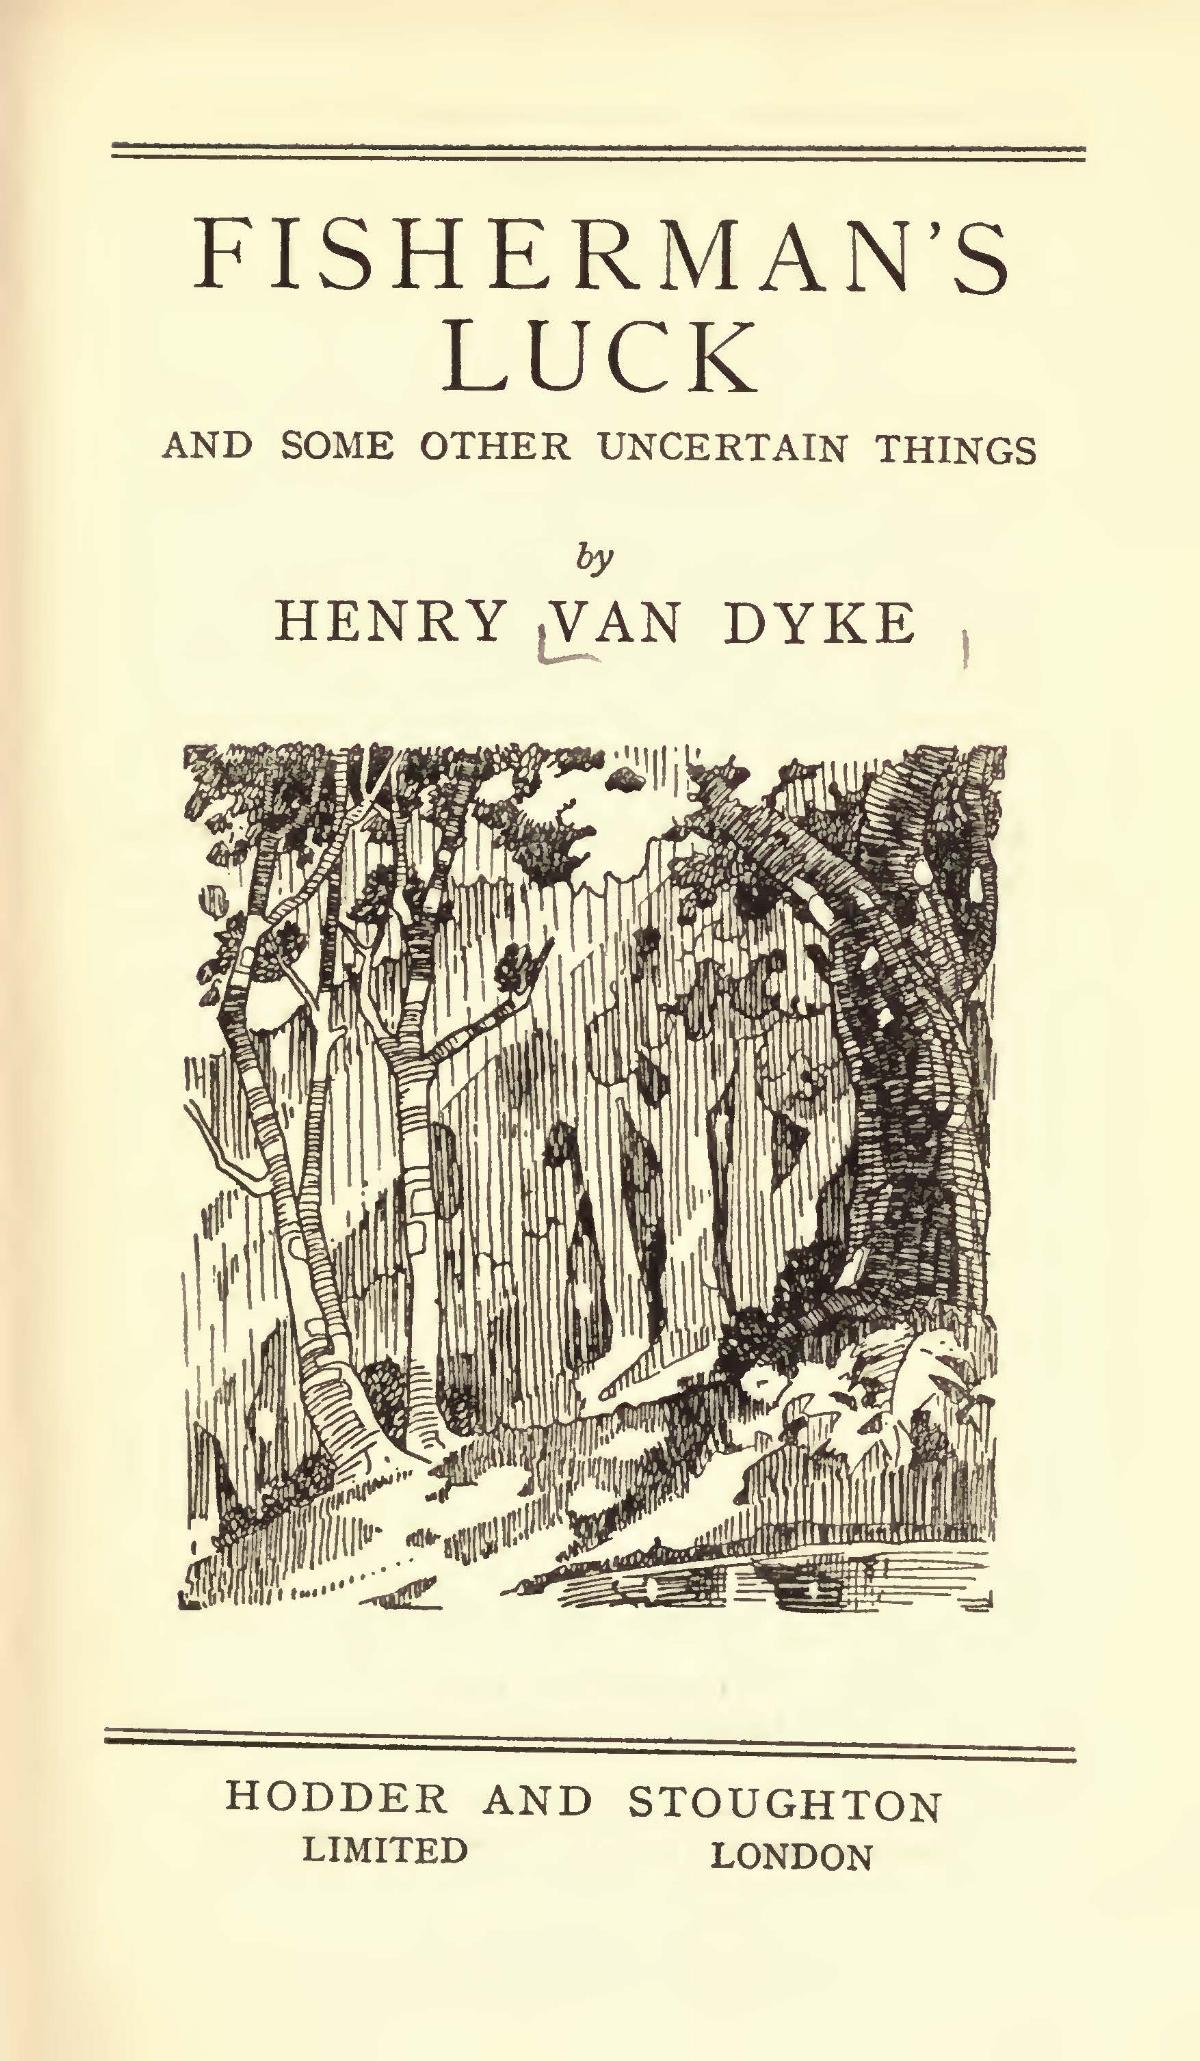 Van Dyke, Jr., Henry Jackson, Fisherman's Luck Title Page.jpg